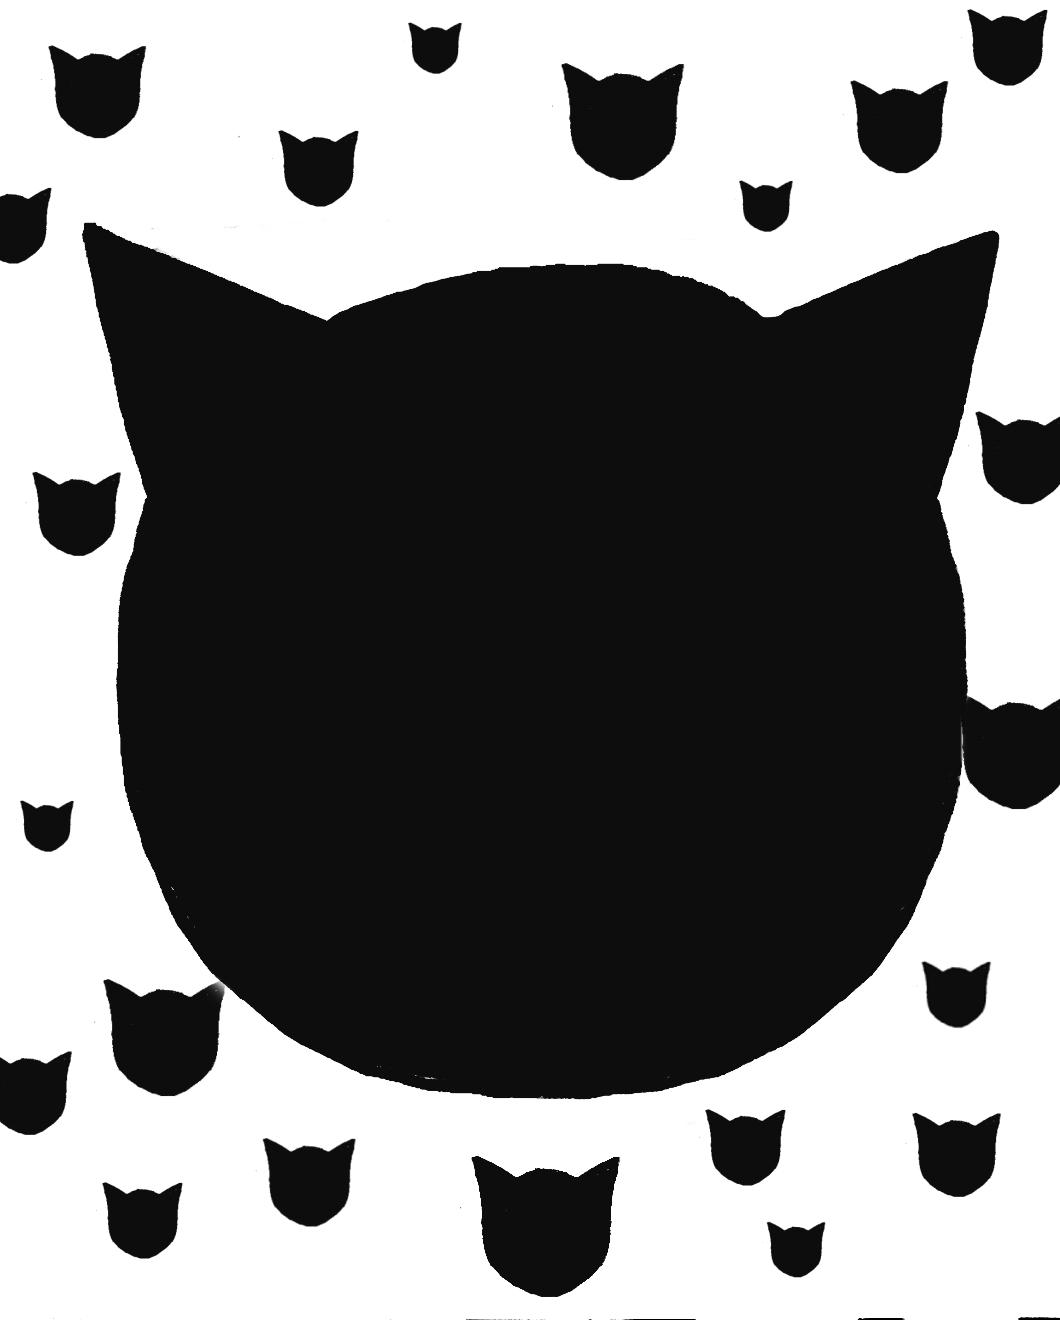 1060x1320 Cat Head Silhouette Clip Art